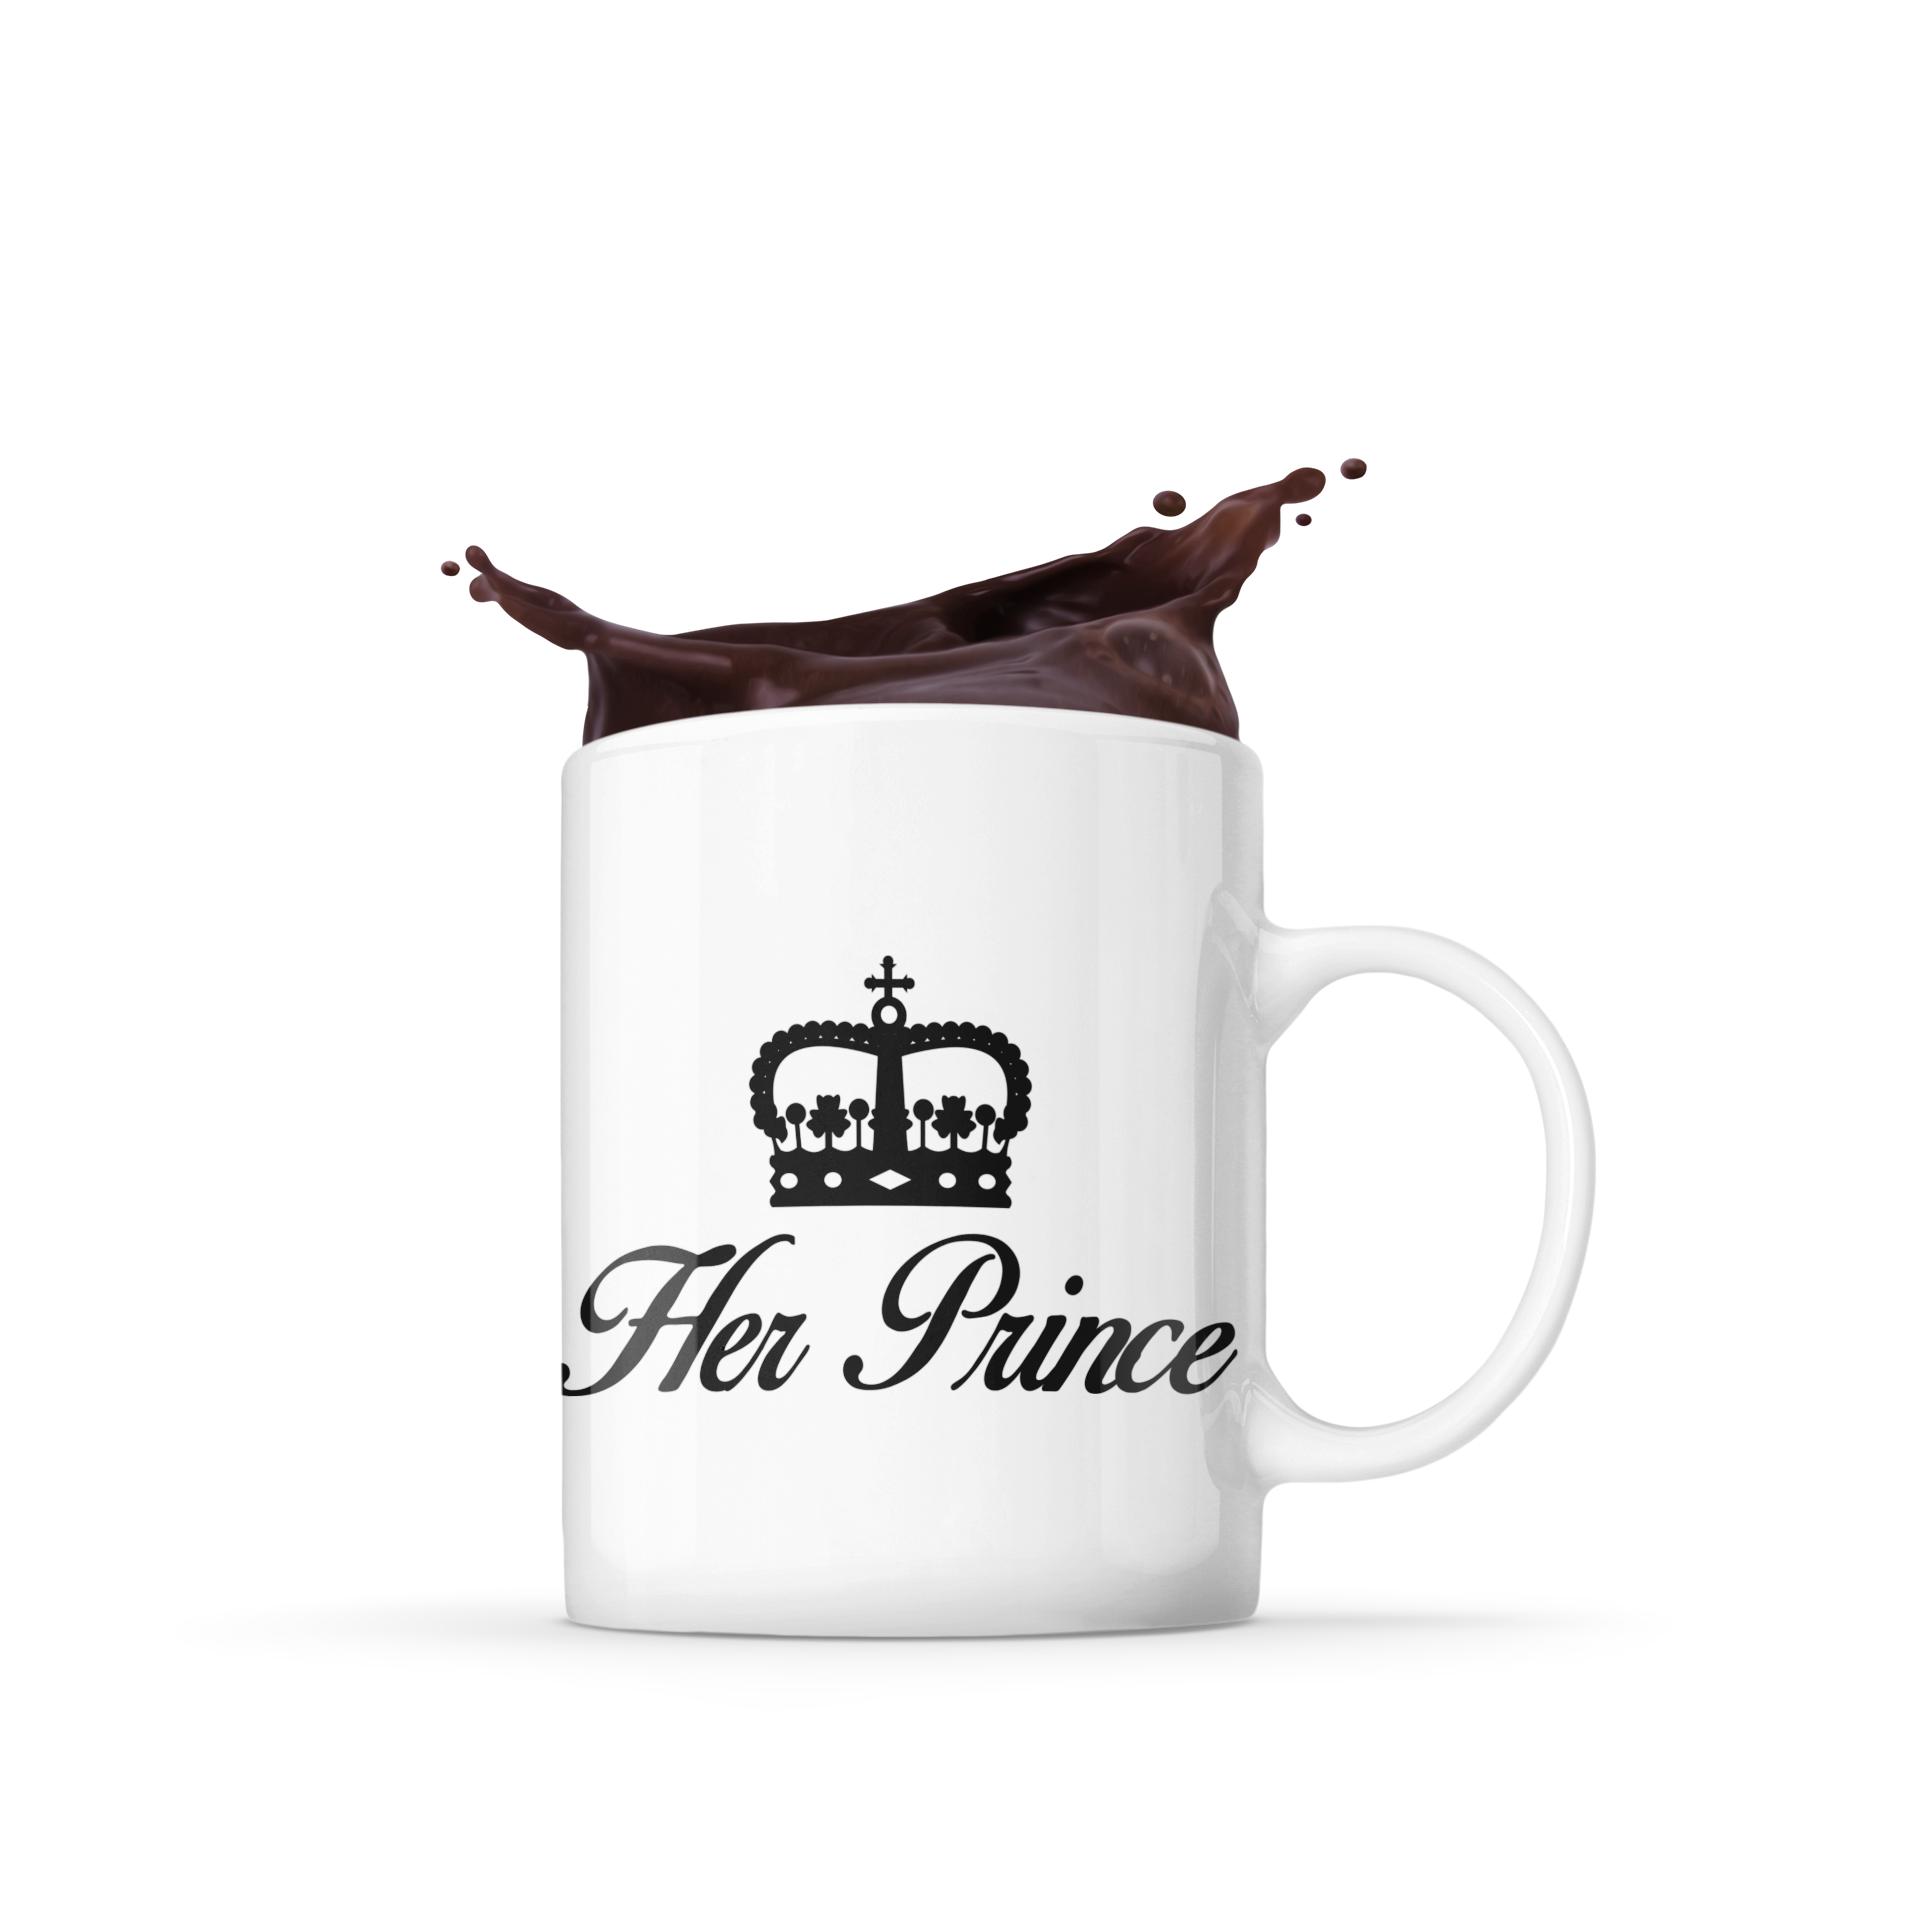 Her Prince